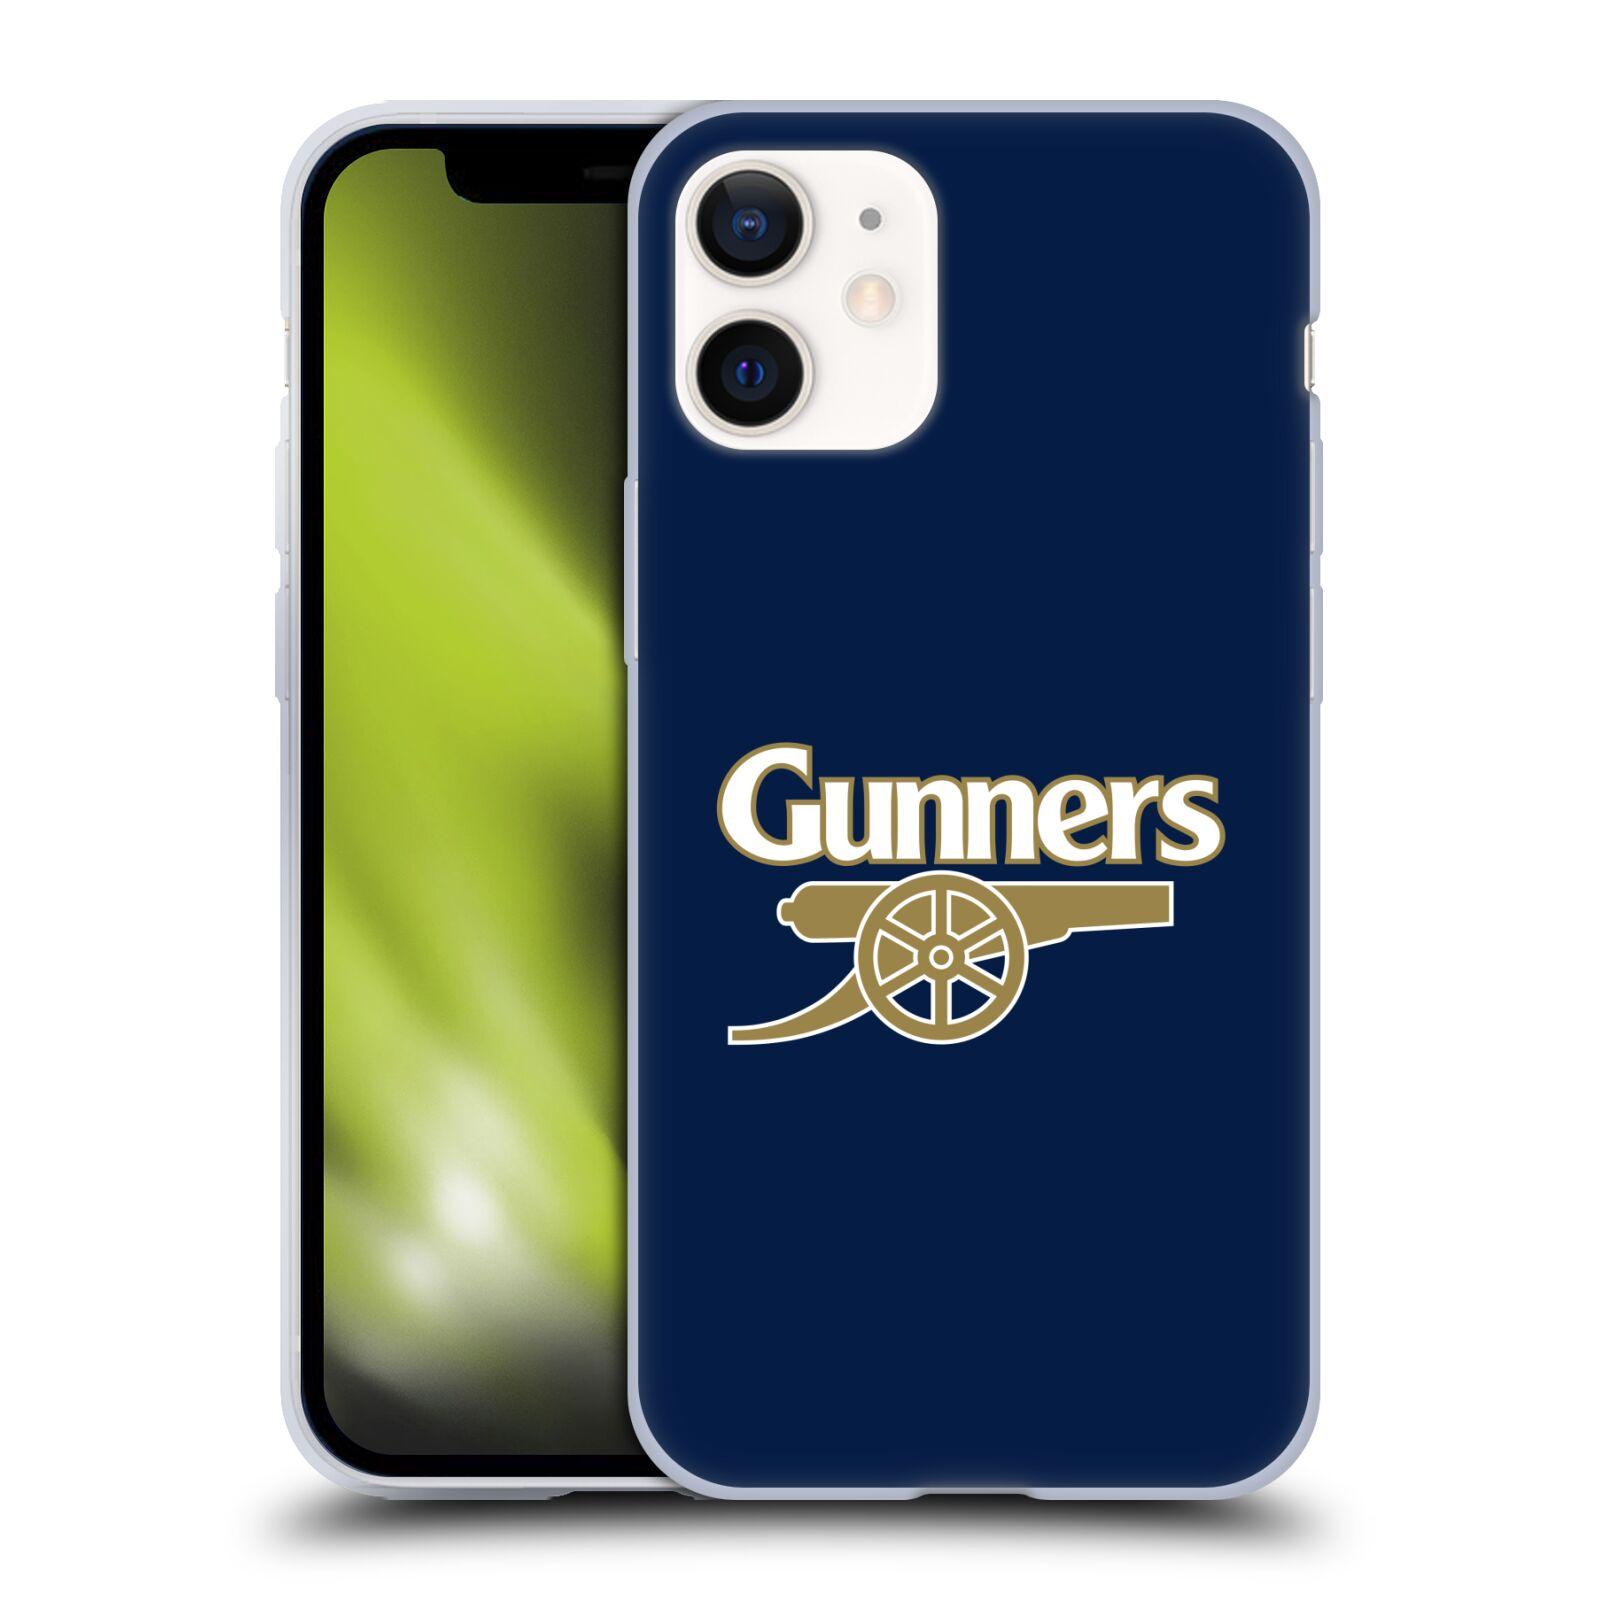 Silikonové pouzdro na mobil Apple iPhone 12 Mini - Head Case - Arsenal FC - Gunners